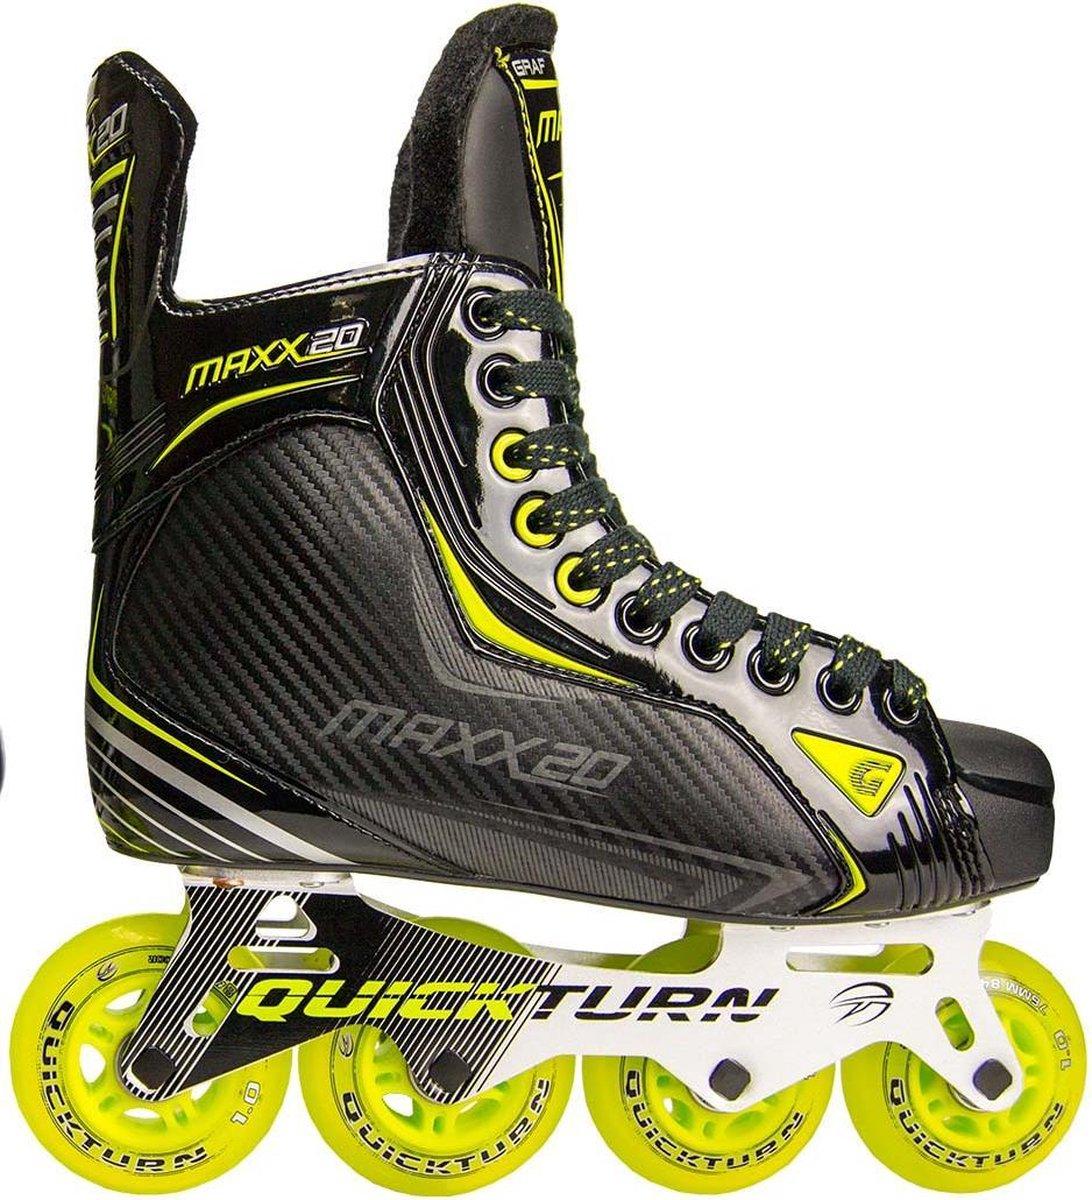 Streethockey inlineskate Graf Maxx 20 inliner maat 44